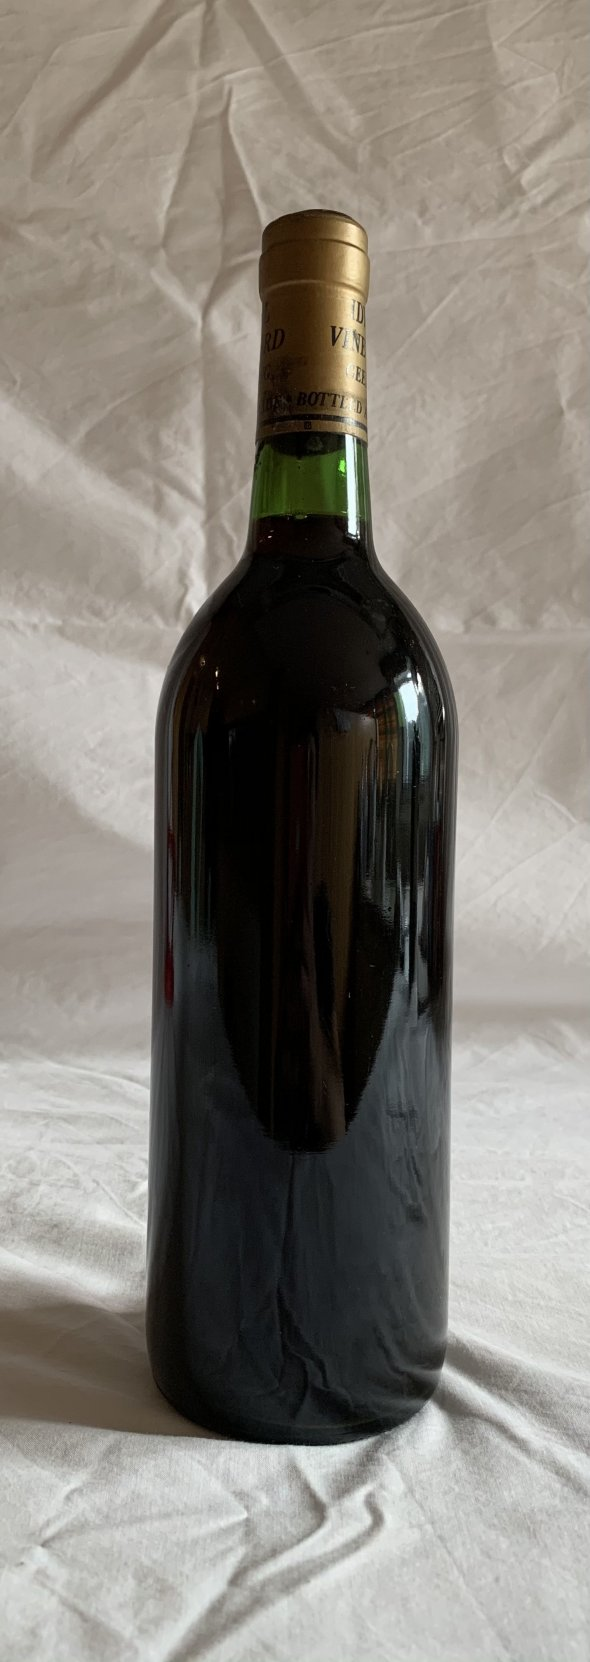 Idyll vineyard Geelong Cabernet Sauvignon/Shiraz